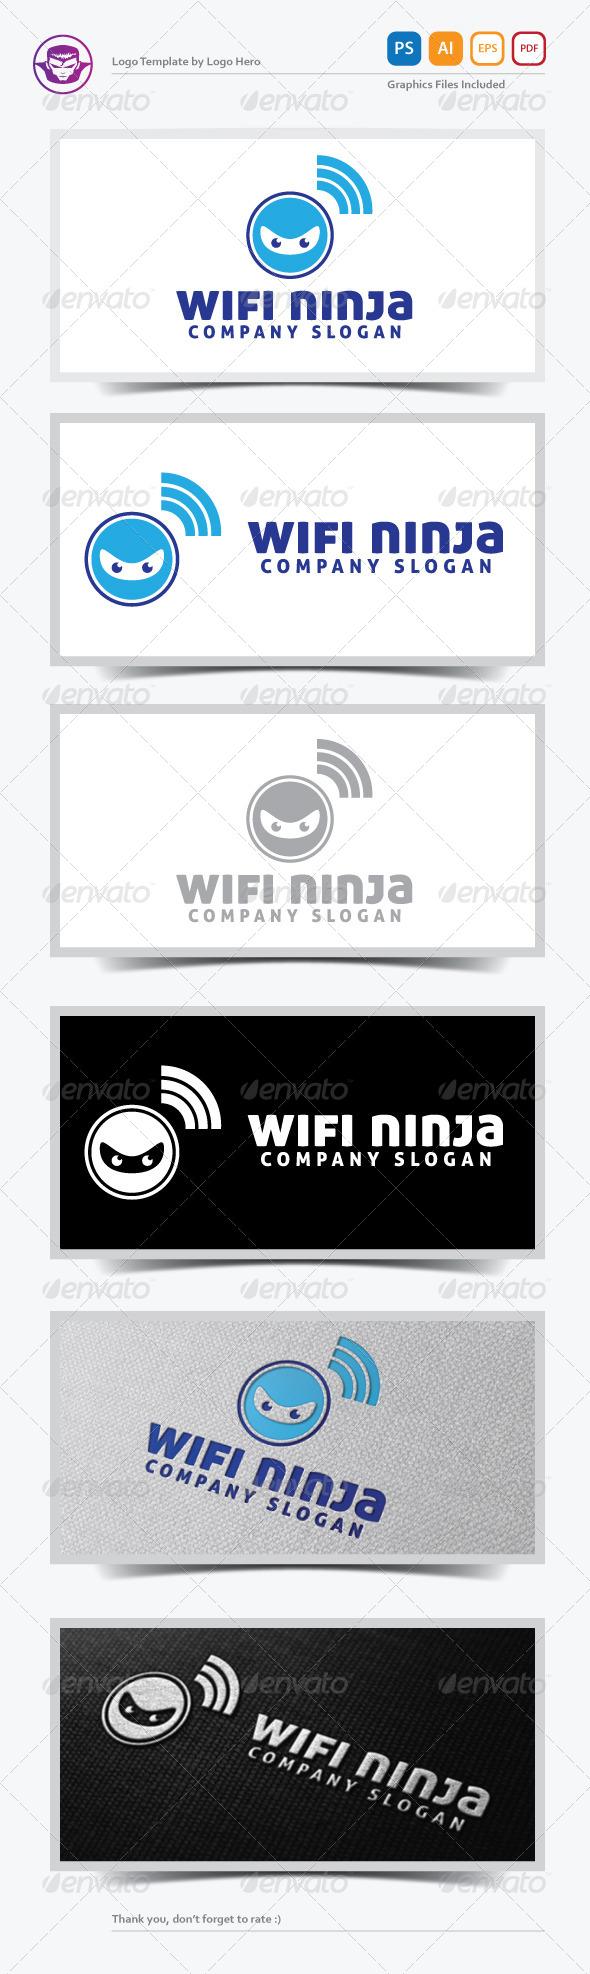 GraphicRiver WiFi Ninja Logo Template 5326321